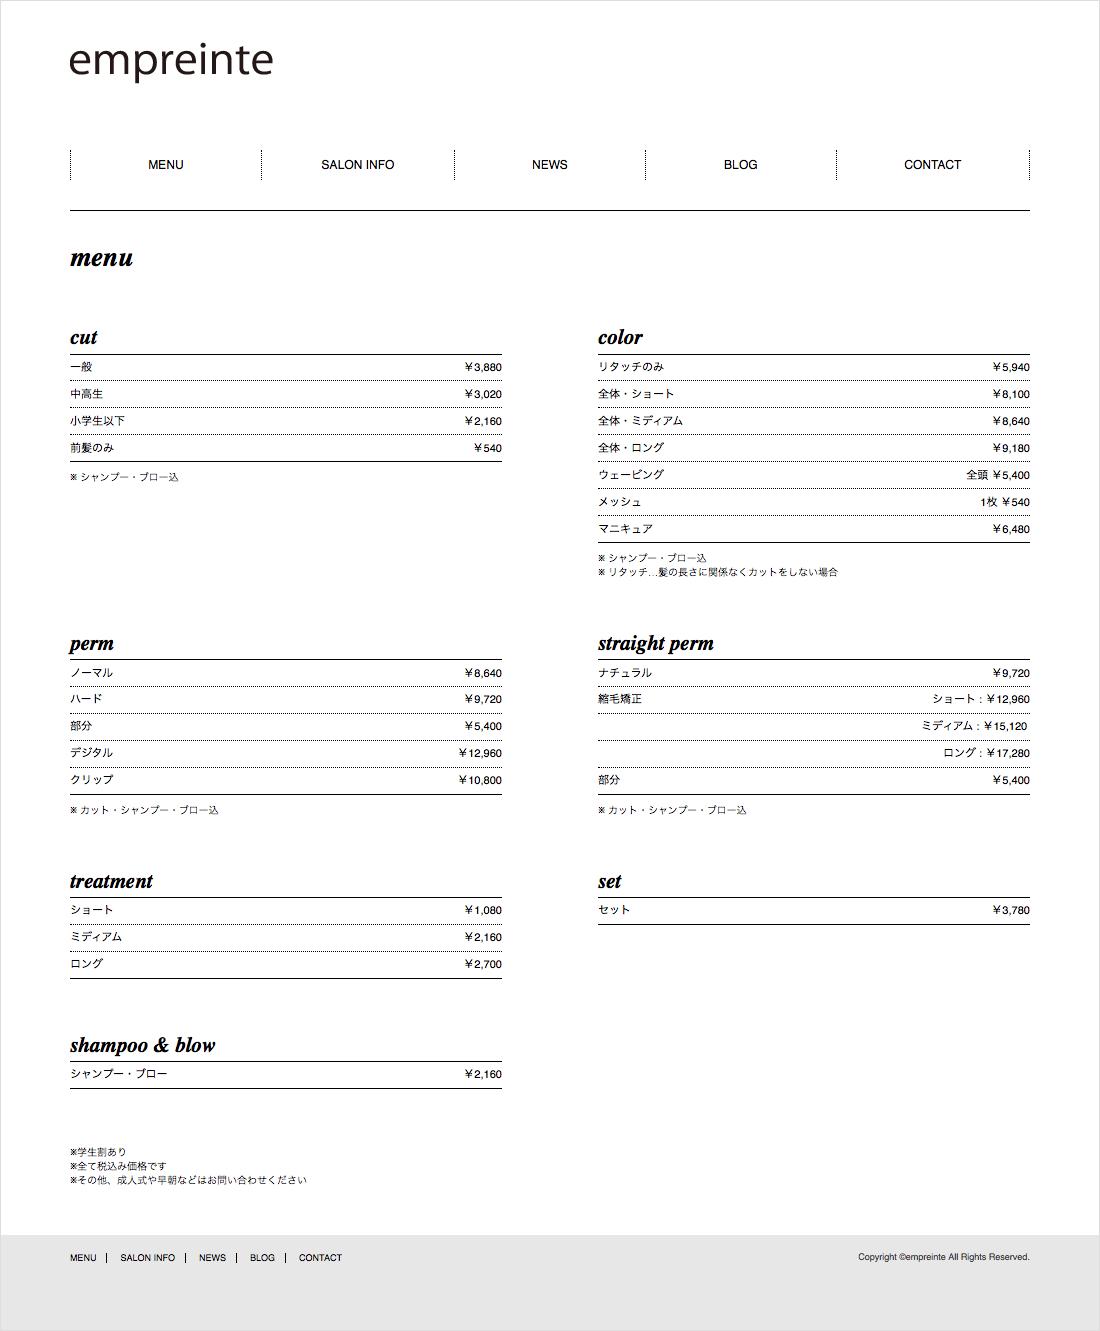 empreinte ホームページデザイン 2